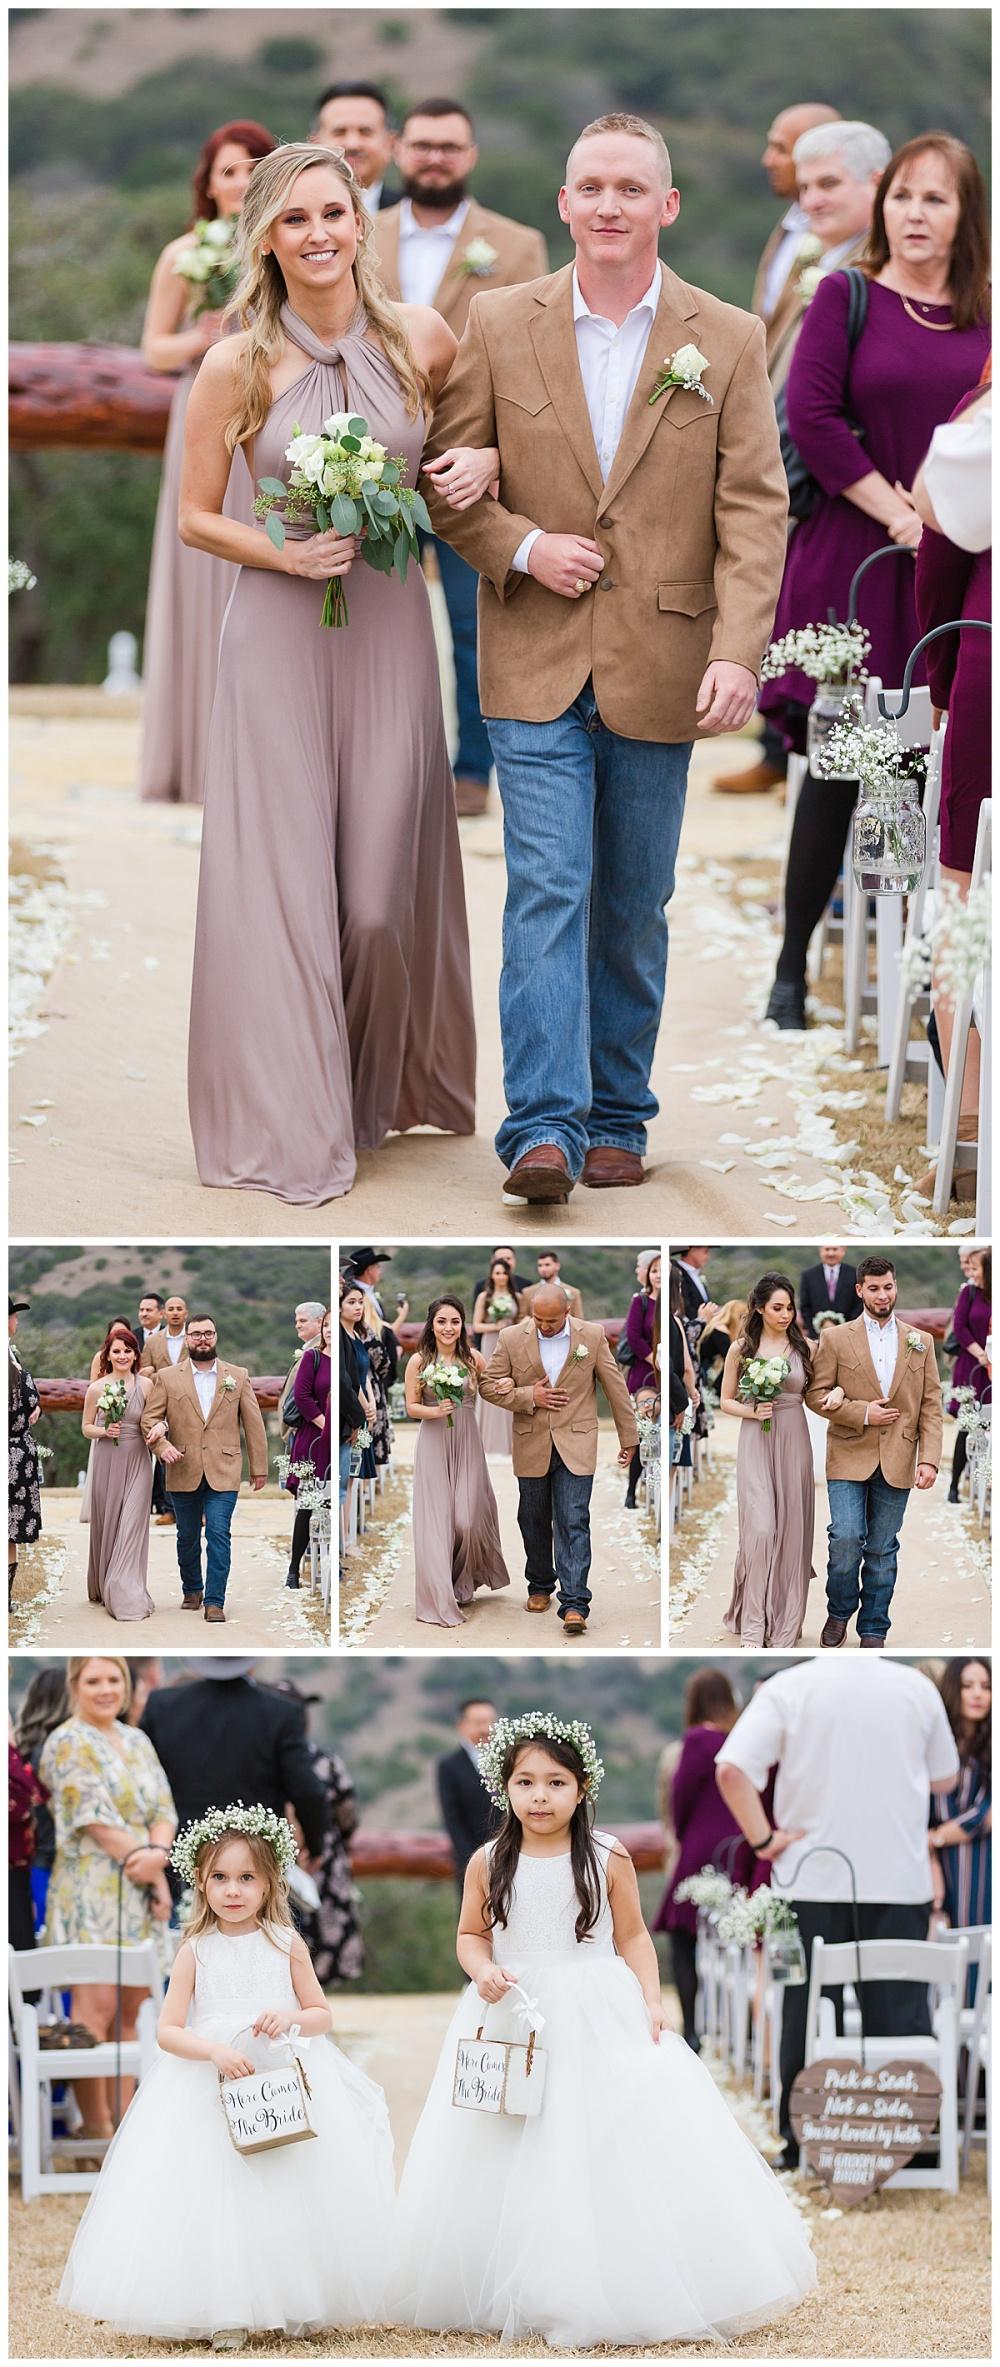 Wedding-Photographer-Texas-Hill-Country-Happy-H-Ranch-Comfor-Texas-Carly-Barton-Photography_0030.jpg